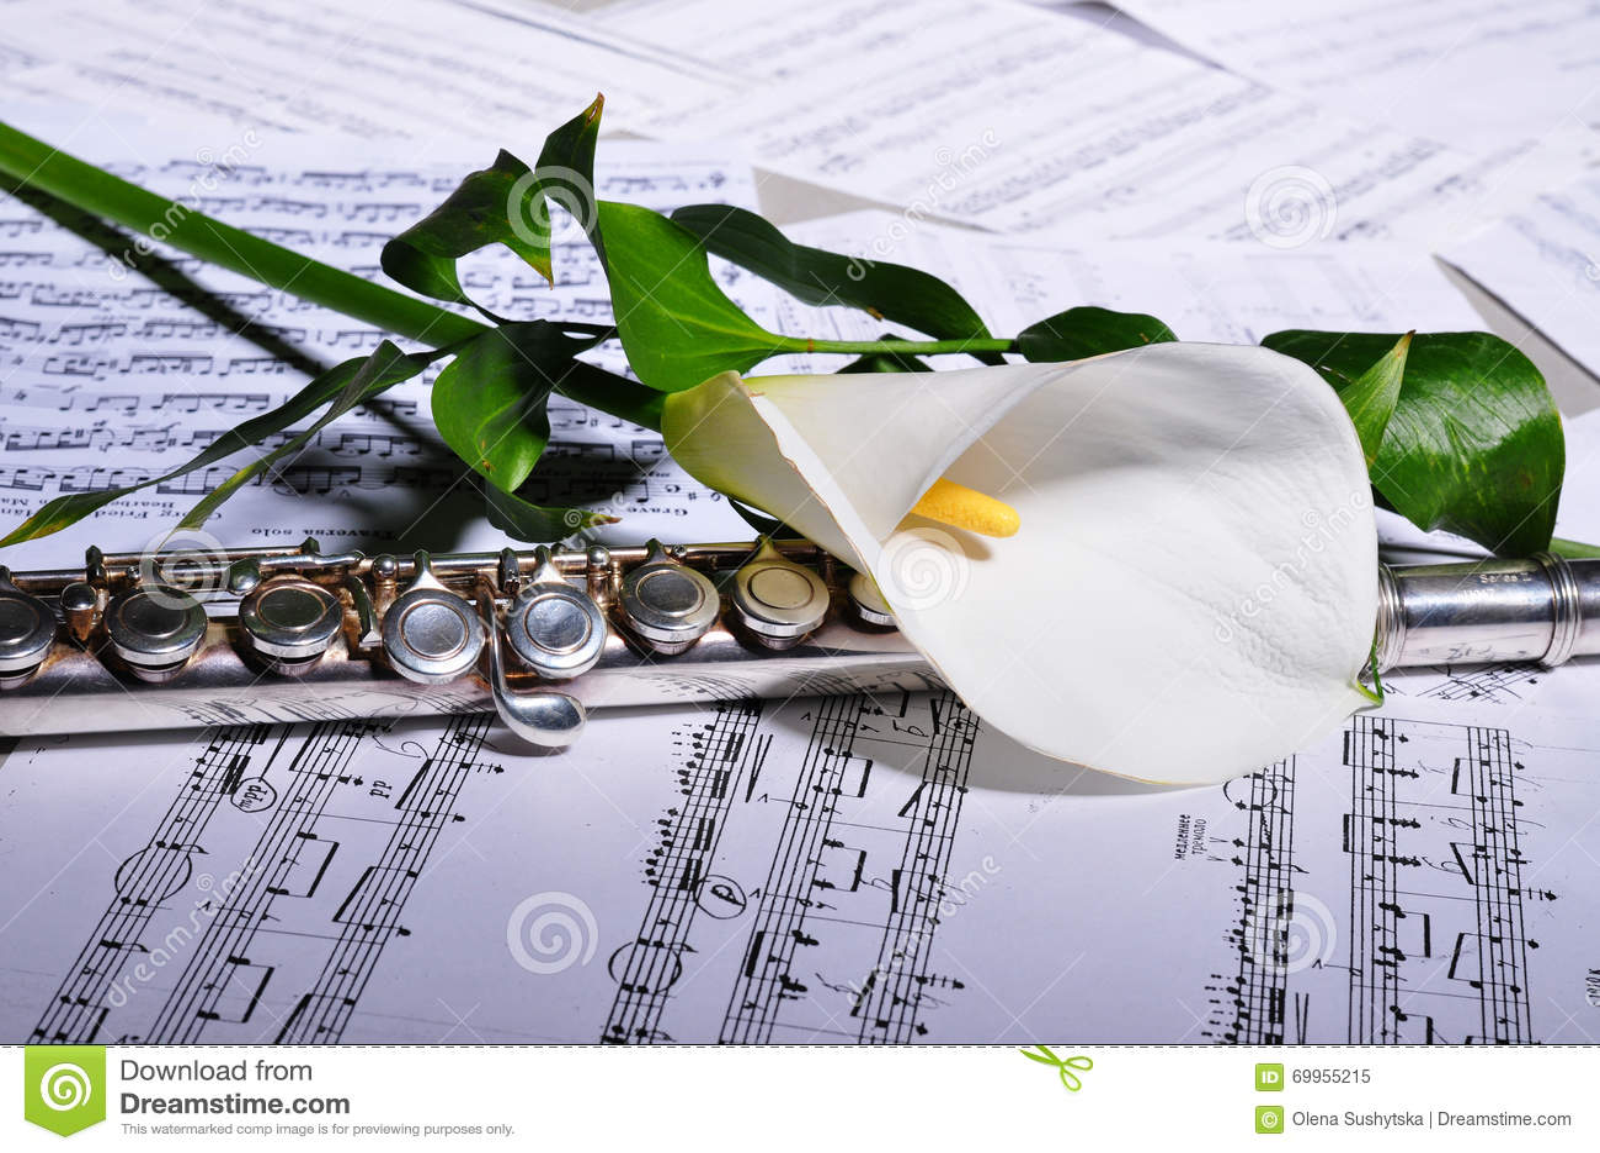 music flower download